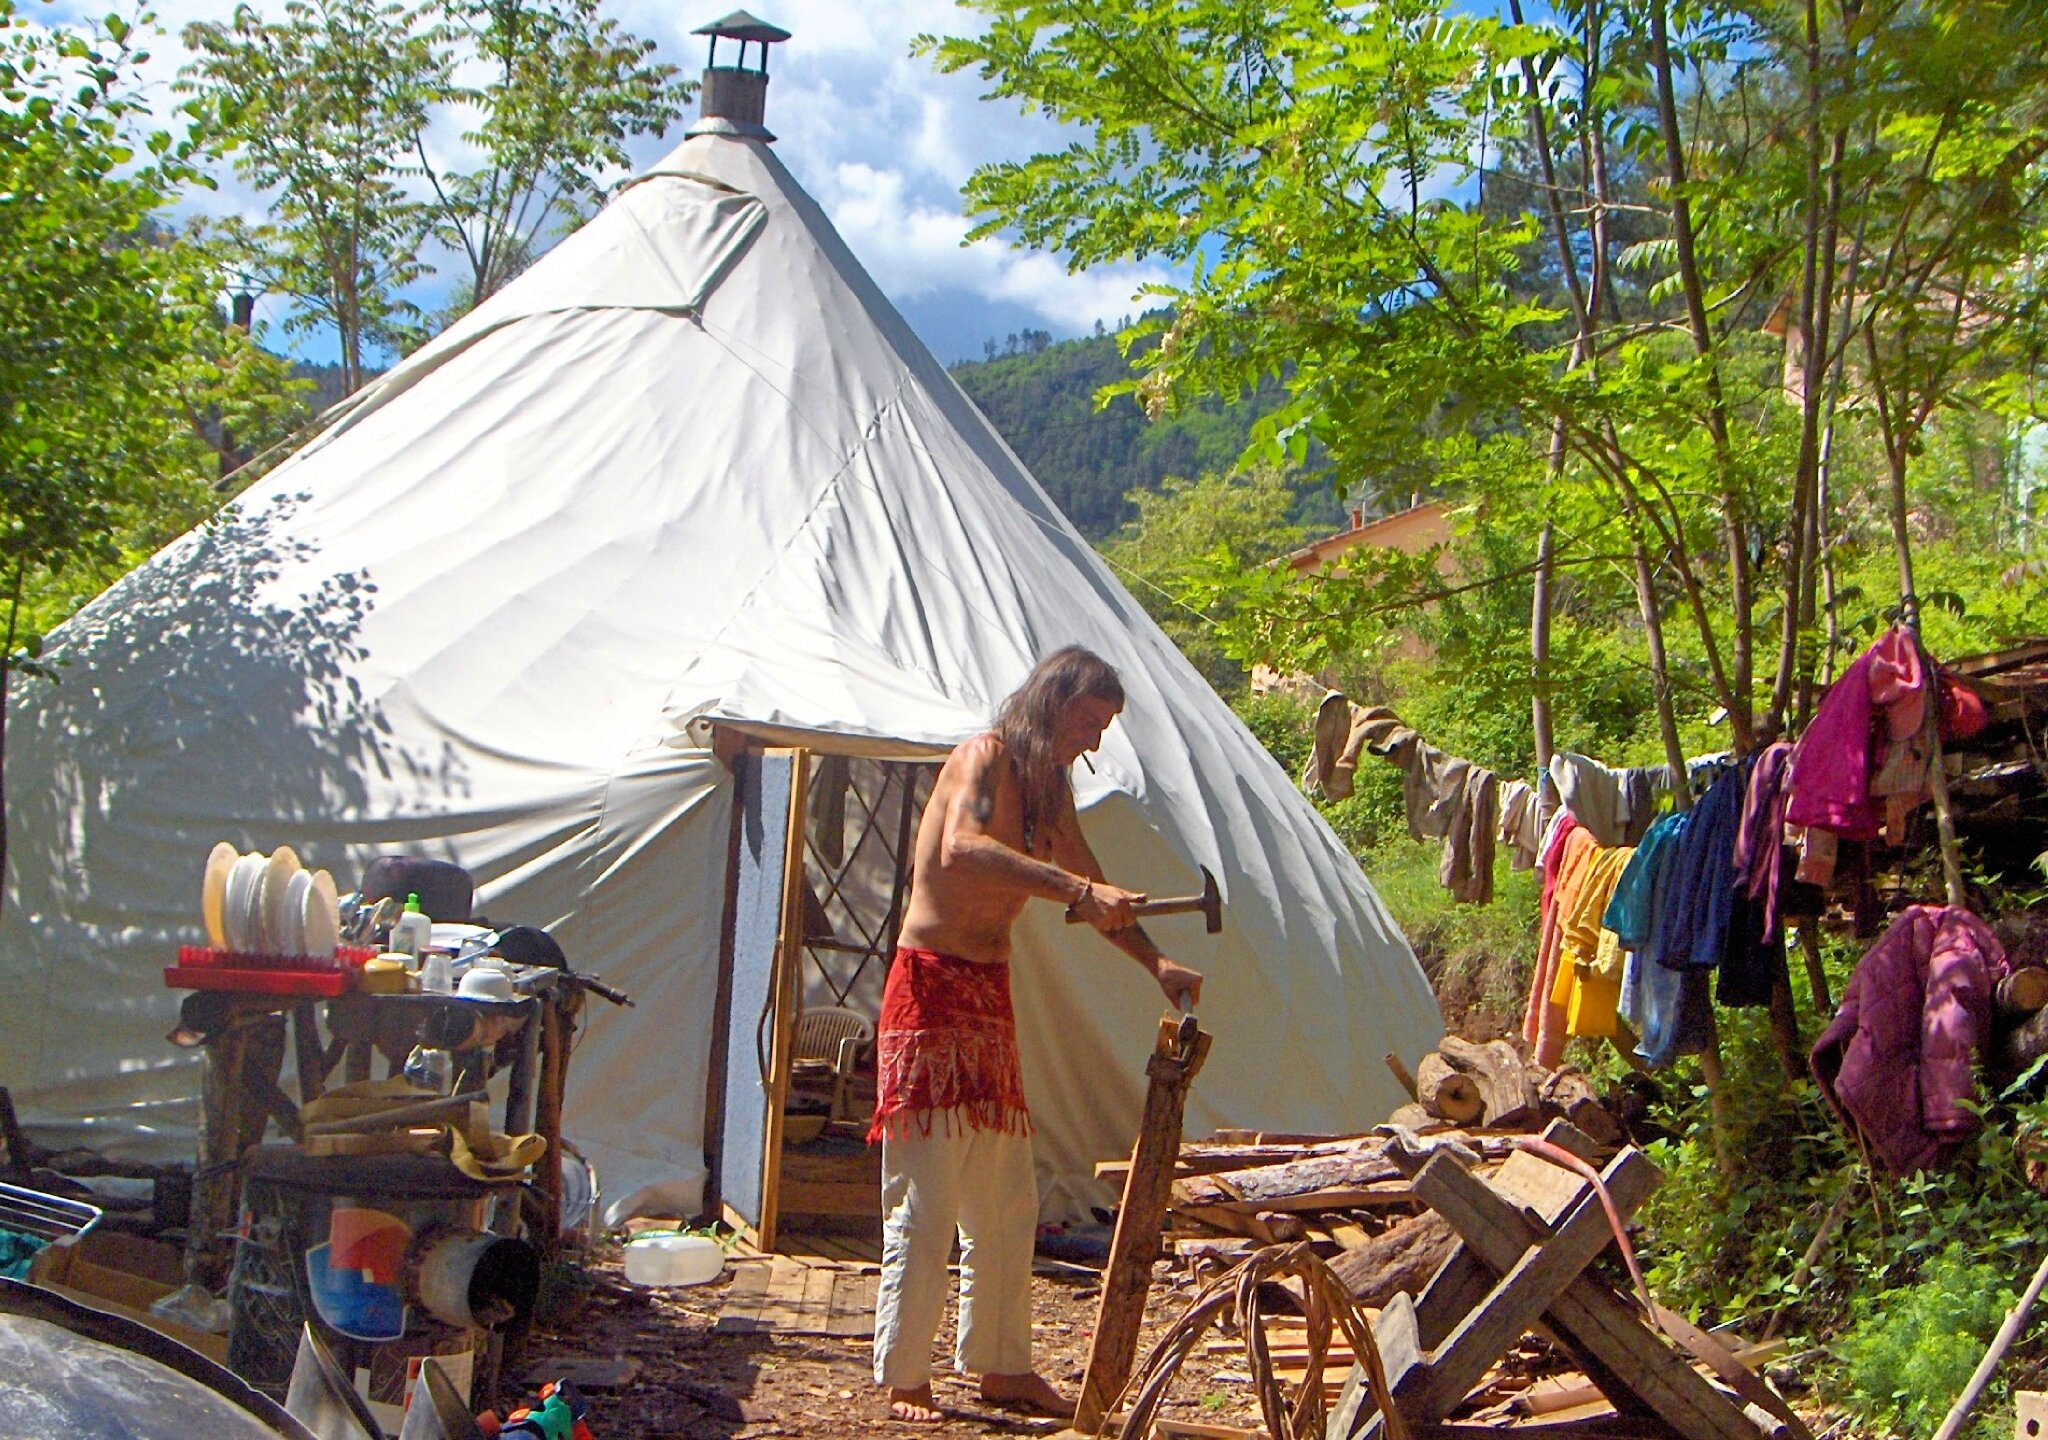 tribu vivace yurtao 29